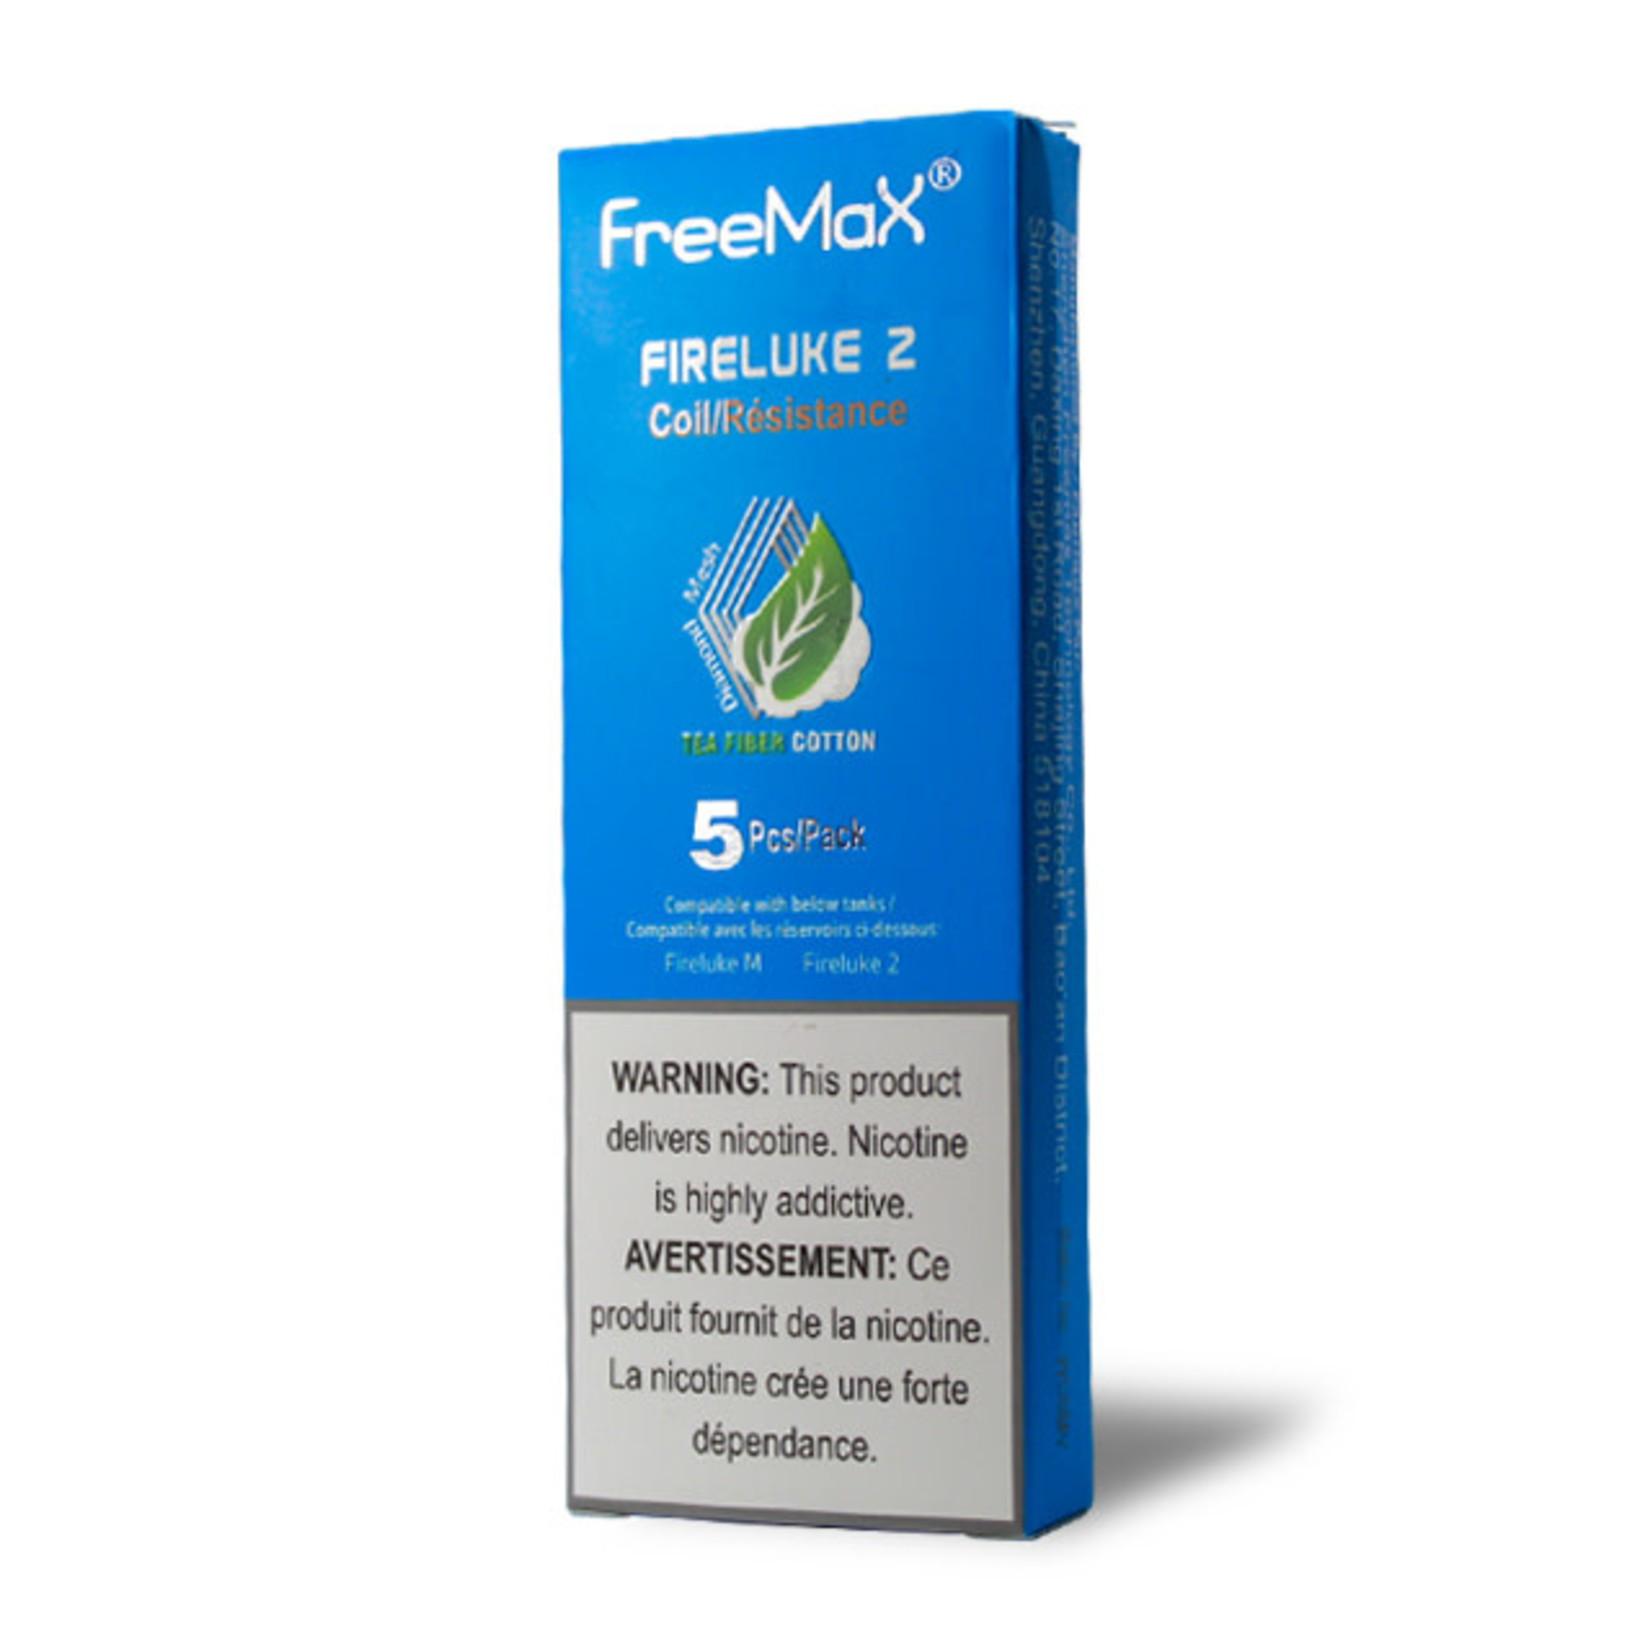 Freemax Fireluke Mesh Replacement Coil TX2 Double Mesh 0.2 ohm Pack (5 pcs)